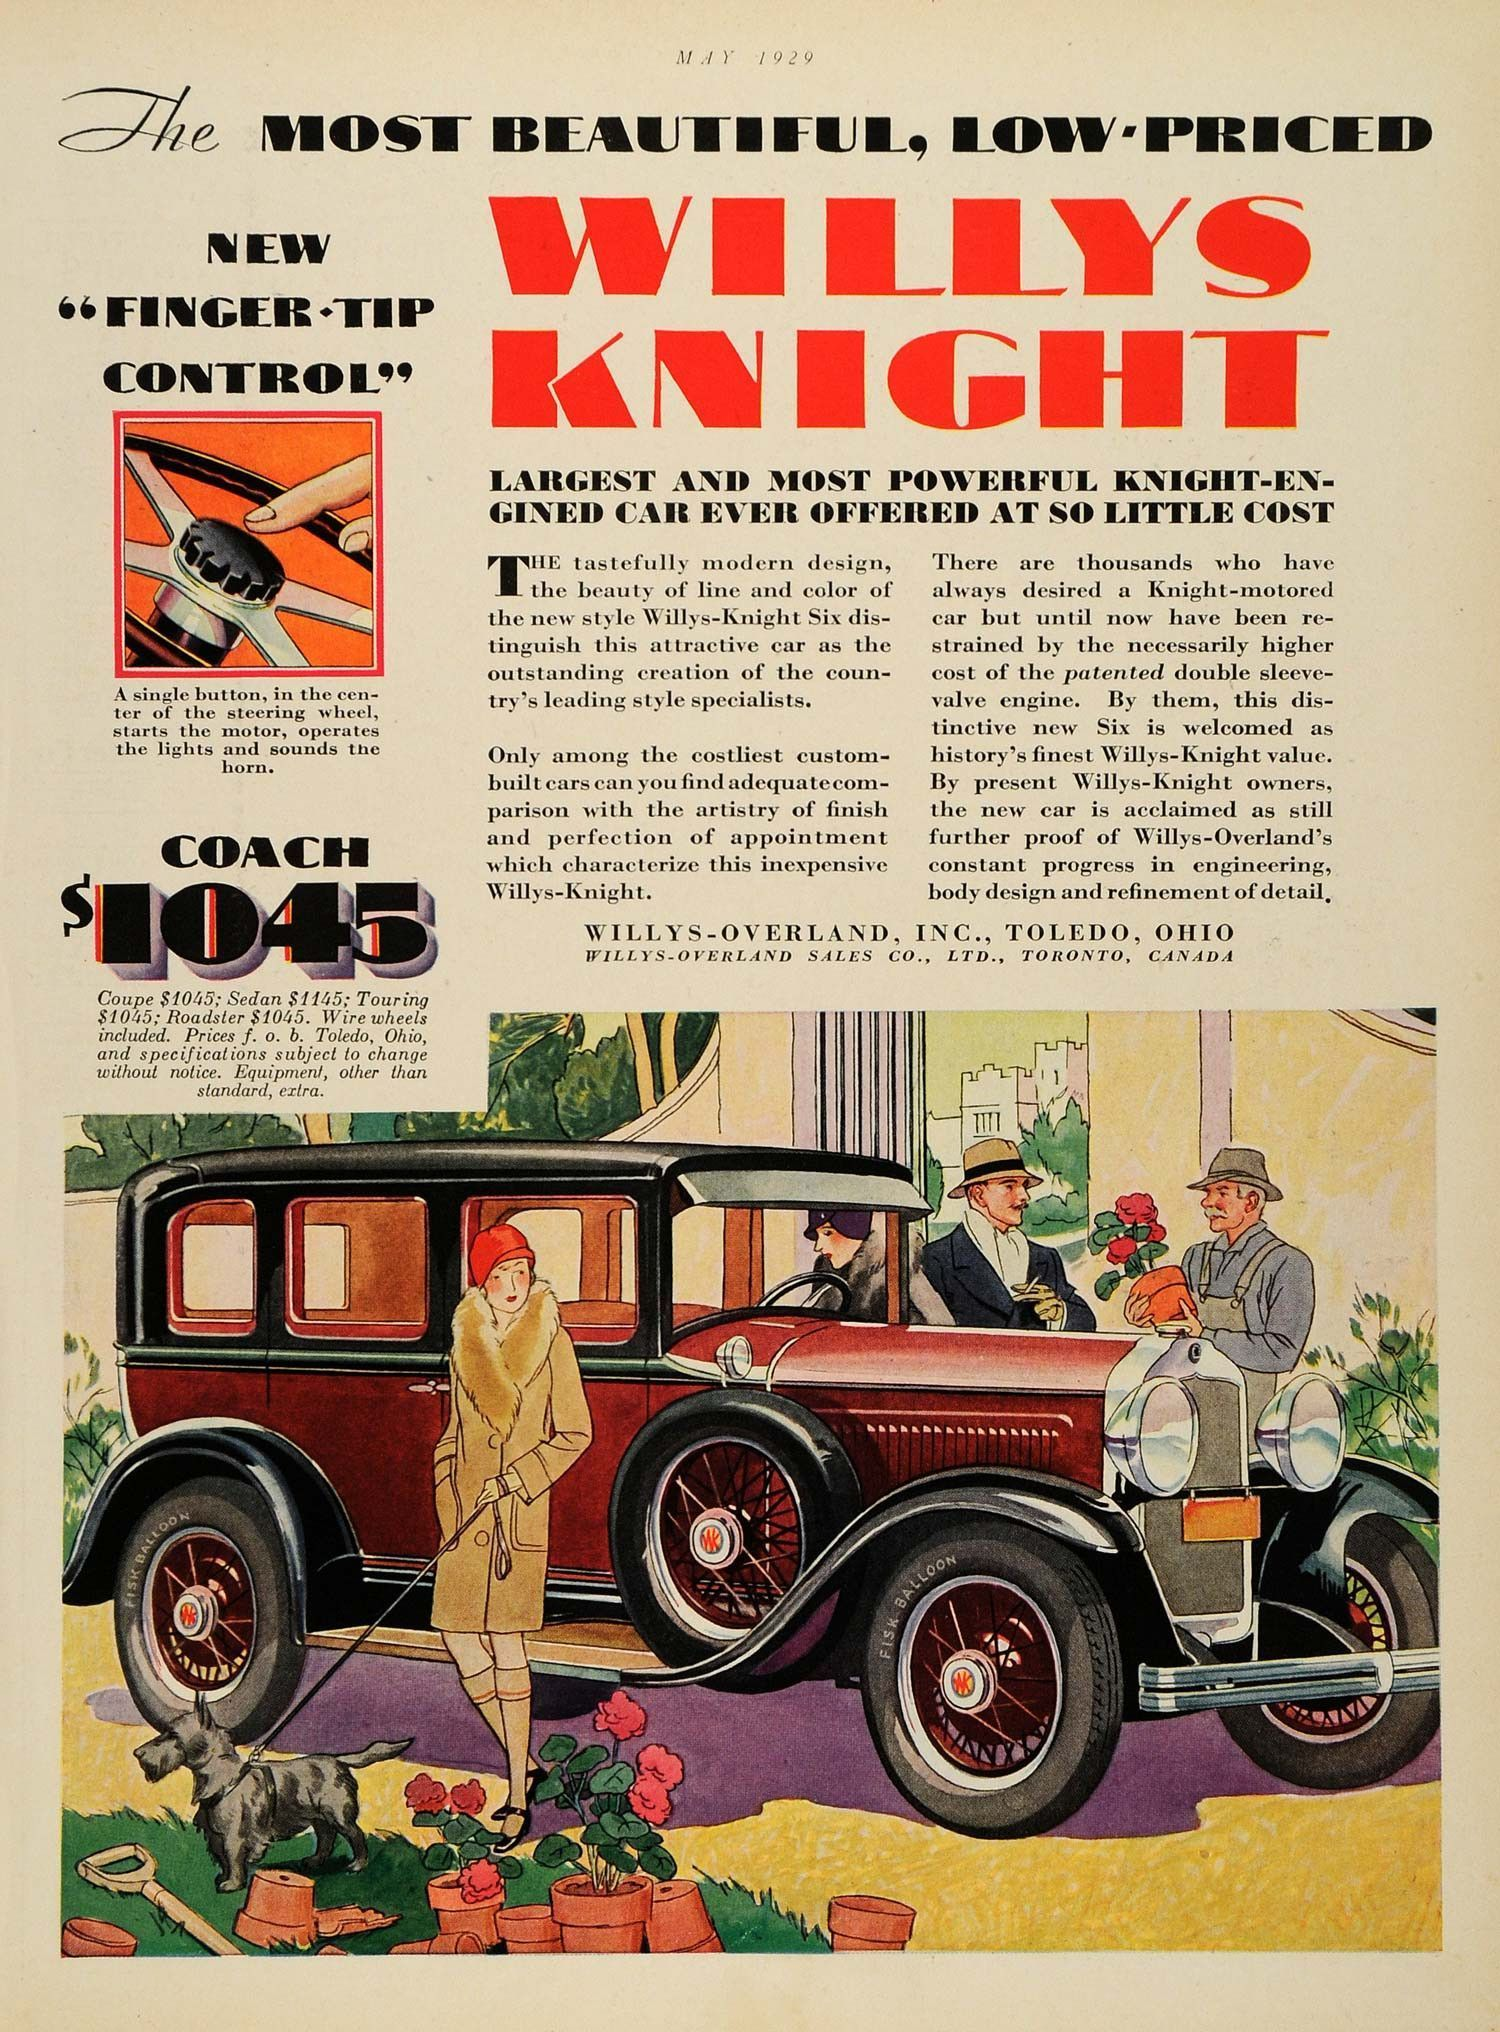 1929 Ad Willys Knight Willys Overland Toledo Ohio Six Automobile